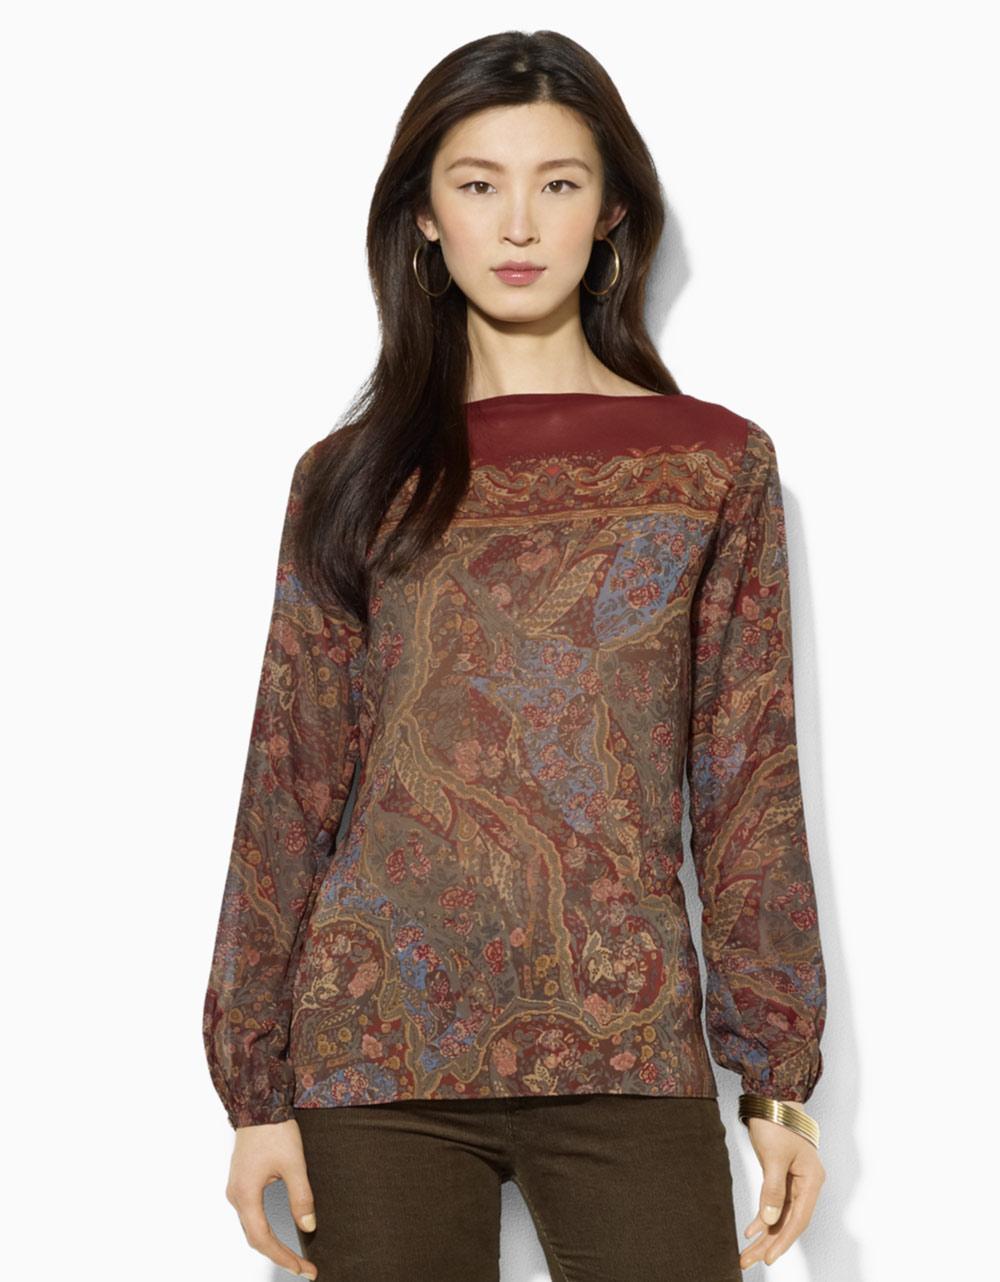 lauren by ralph lauren georgette boatneck blouse in brown multi lyst. Black Bedroom Furniture Sets. Home Design Ideas